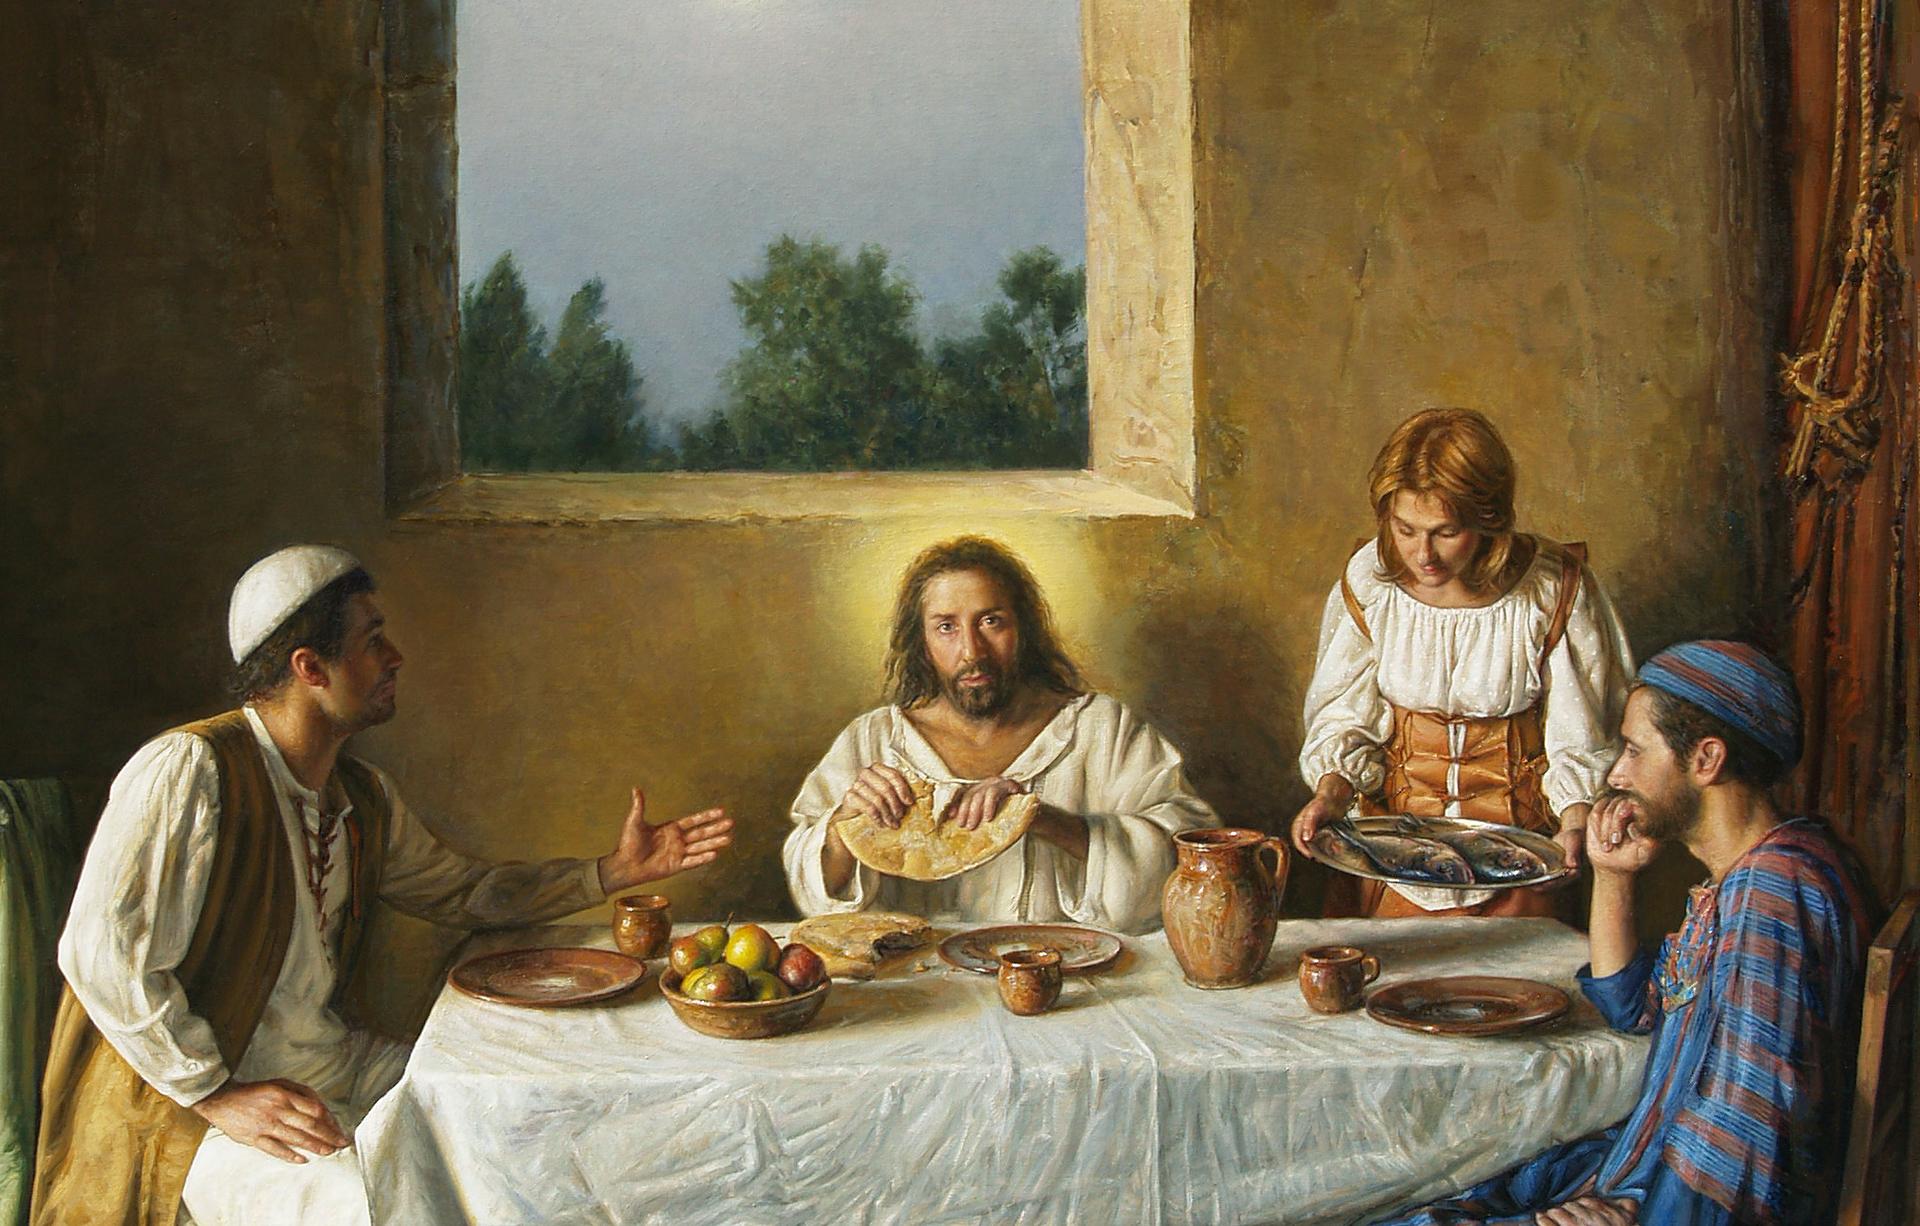 Come i discepoli di Emmaus...